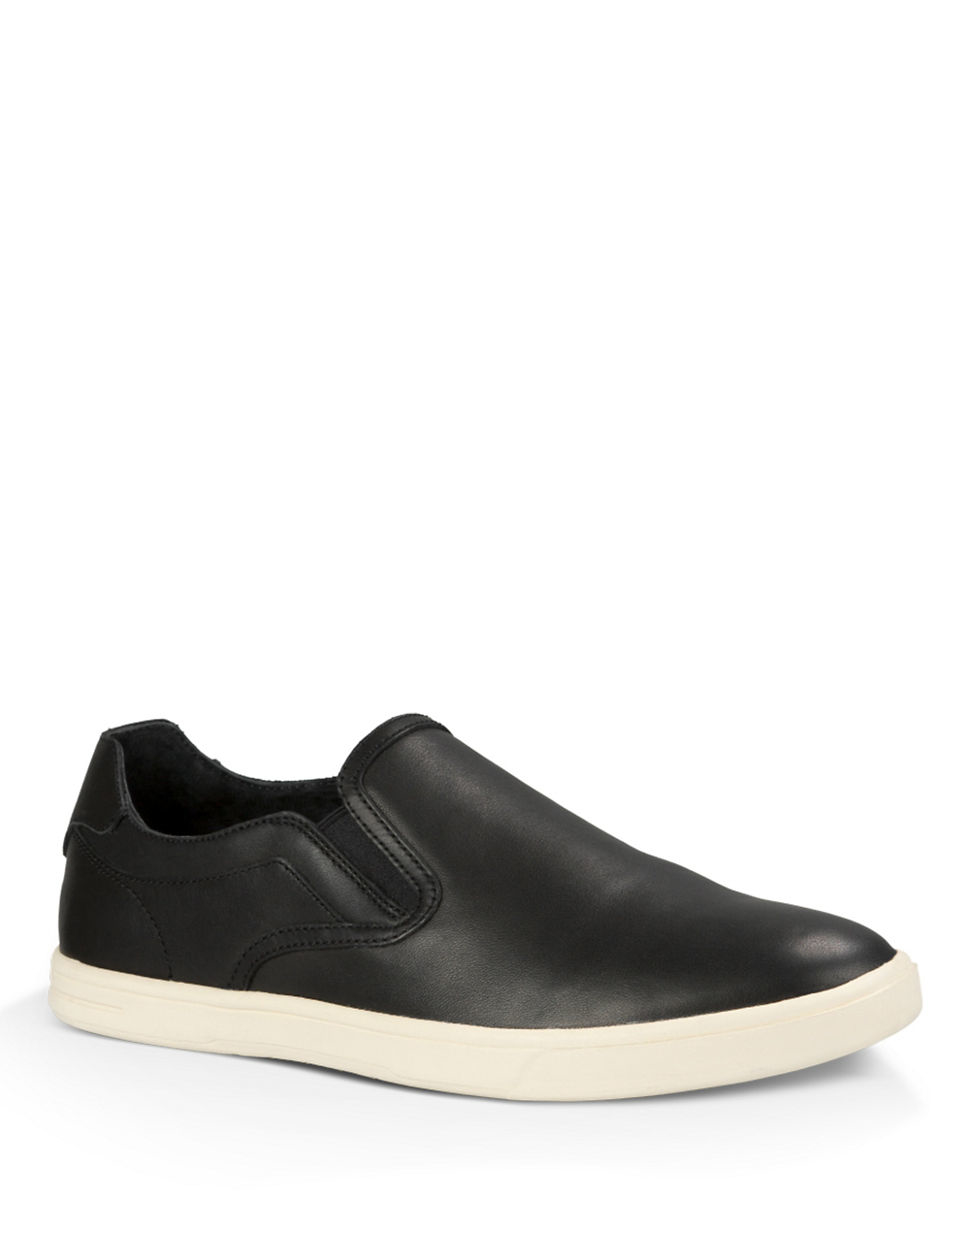 Ugg Slip On Tennis Shoes